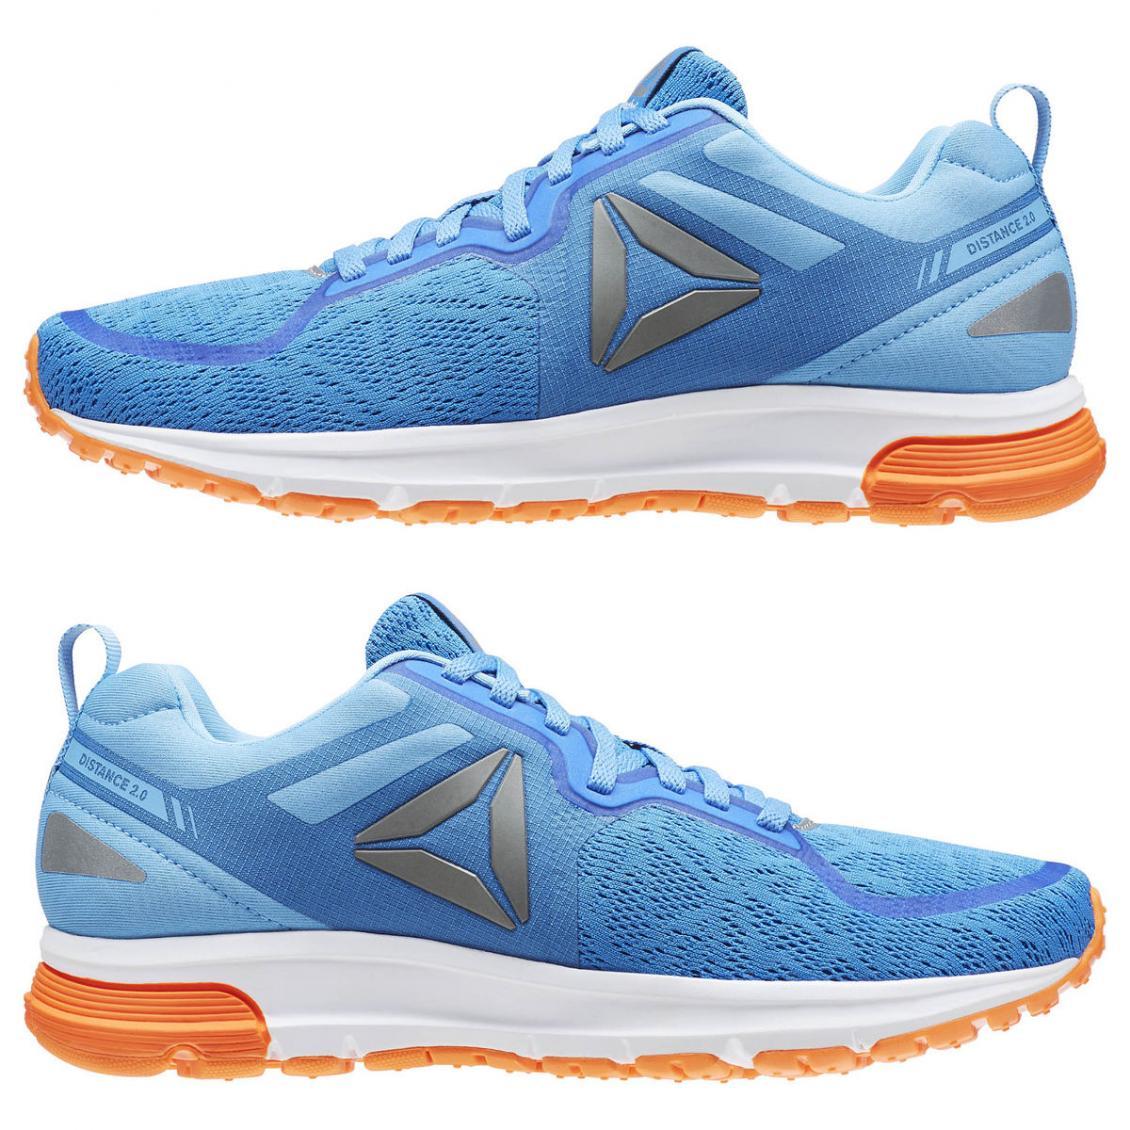 Blue – Reebok One Distance 2.0 Womens Echo Blue / Sky Blue / White / Pewter / Wild Orange